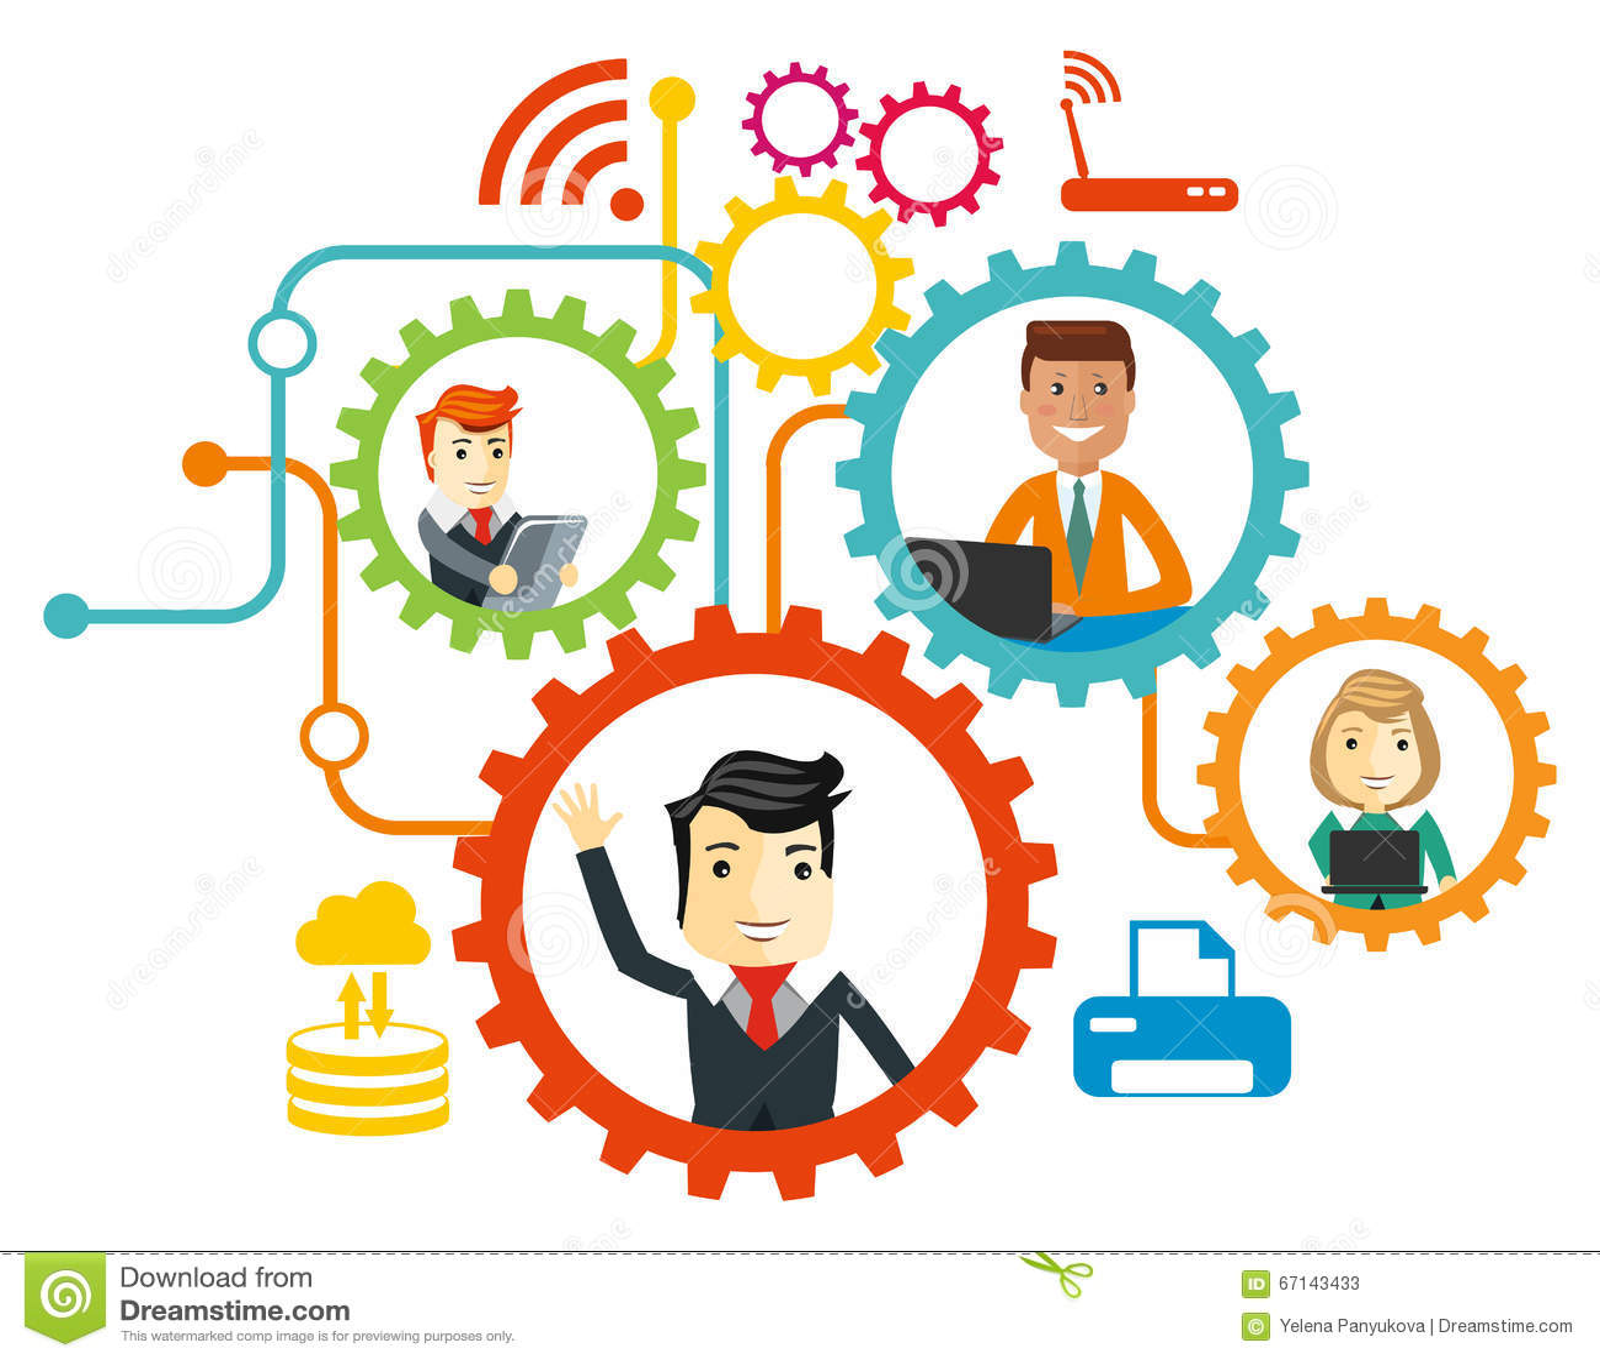 Business team cartoon characters cartoon vector cartoondealer com - Business Team Cartoon Characters Vector Illustration Cartoondealer Com 68097950